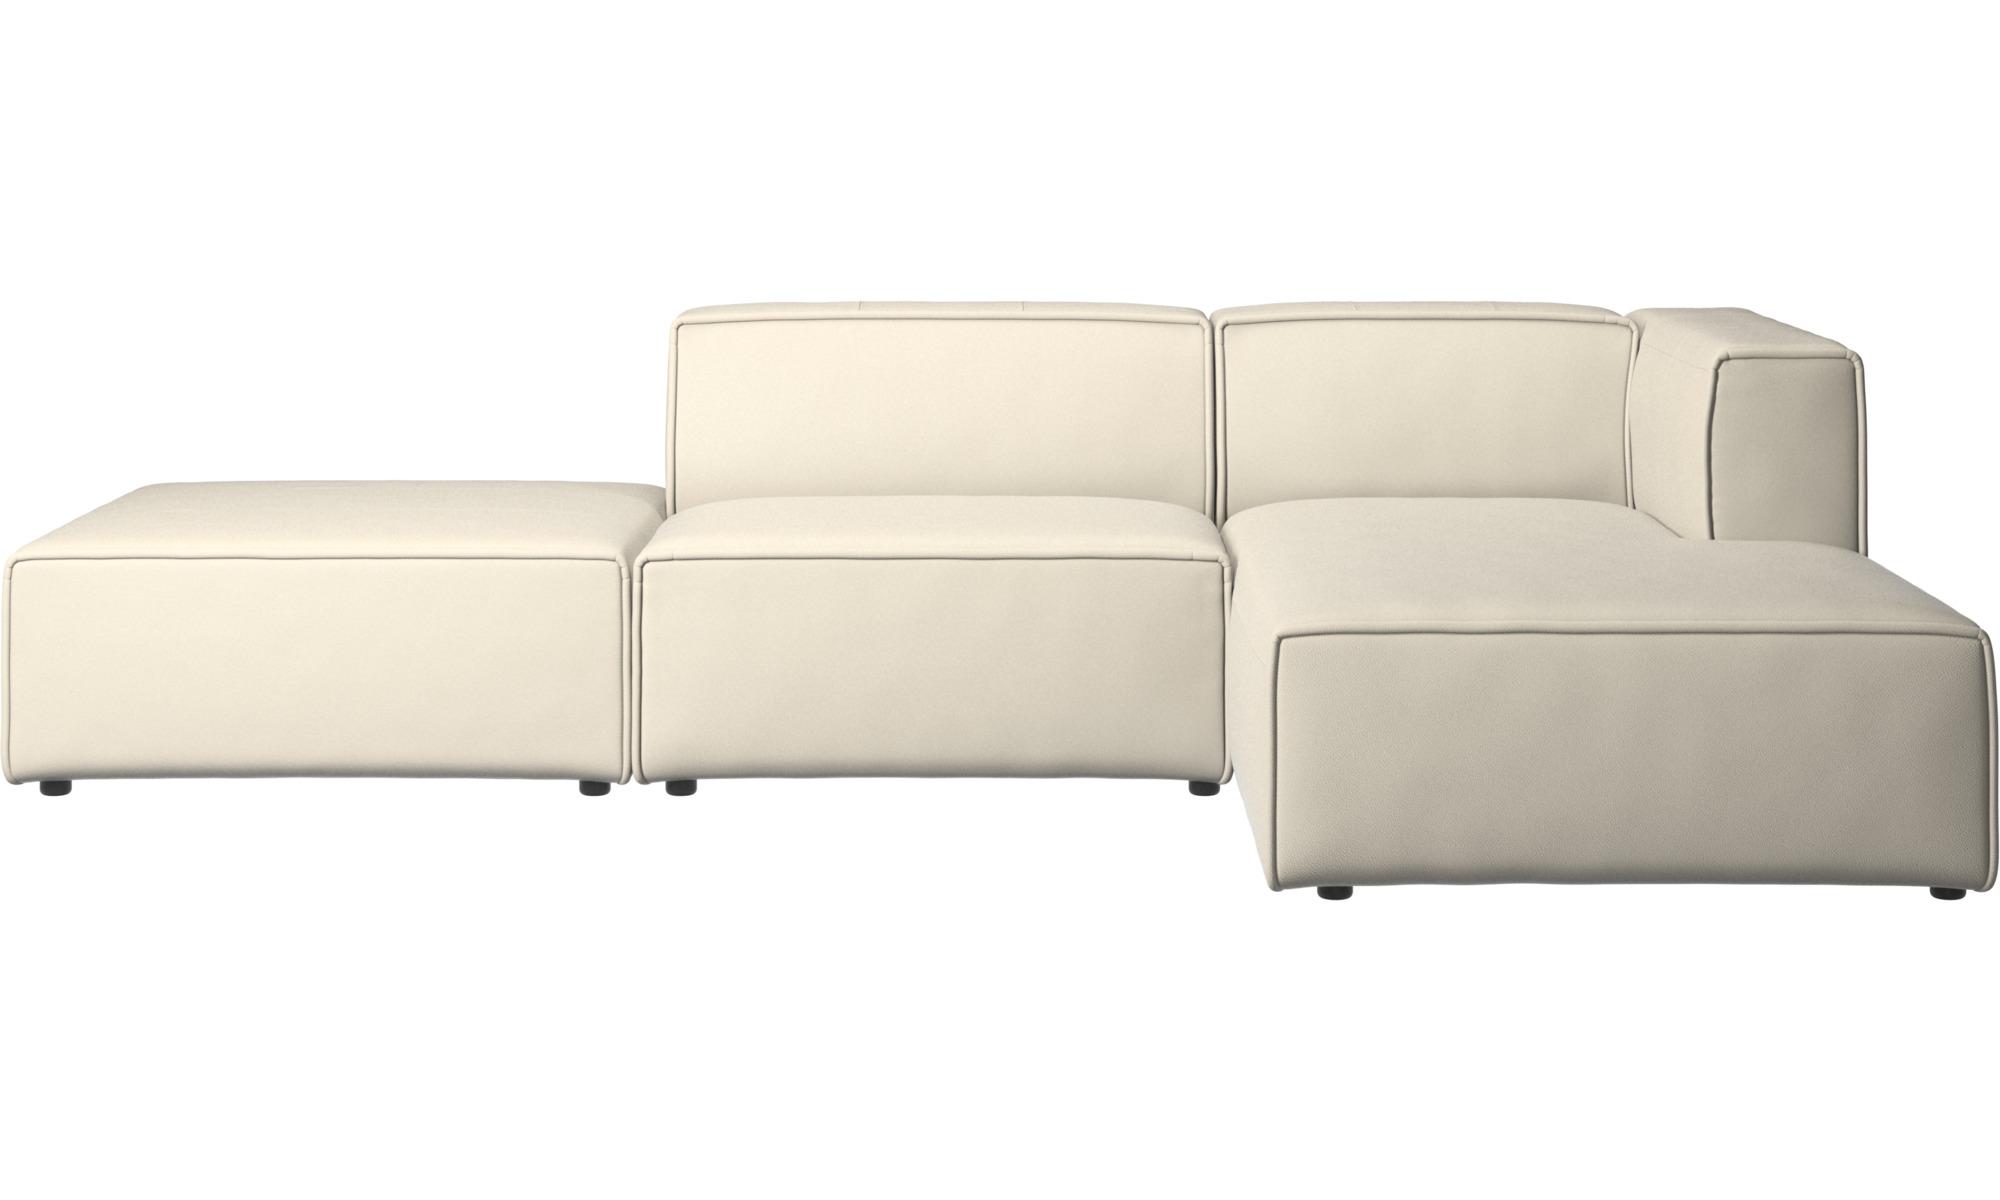 Modular sofas - Carmo sofa with resting unit - White - Leather